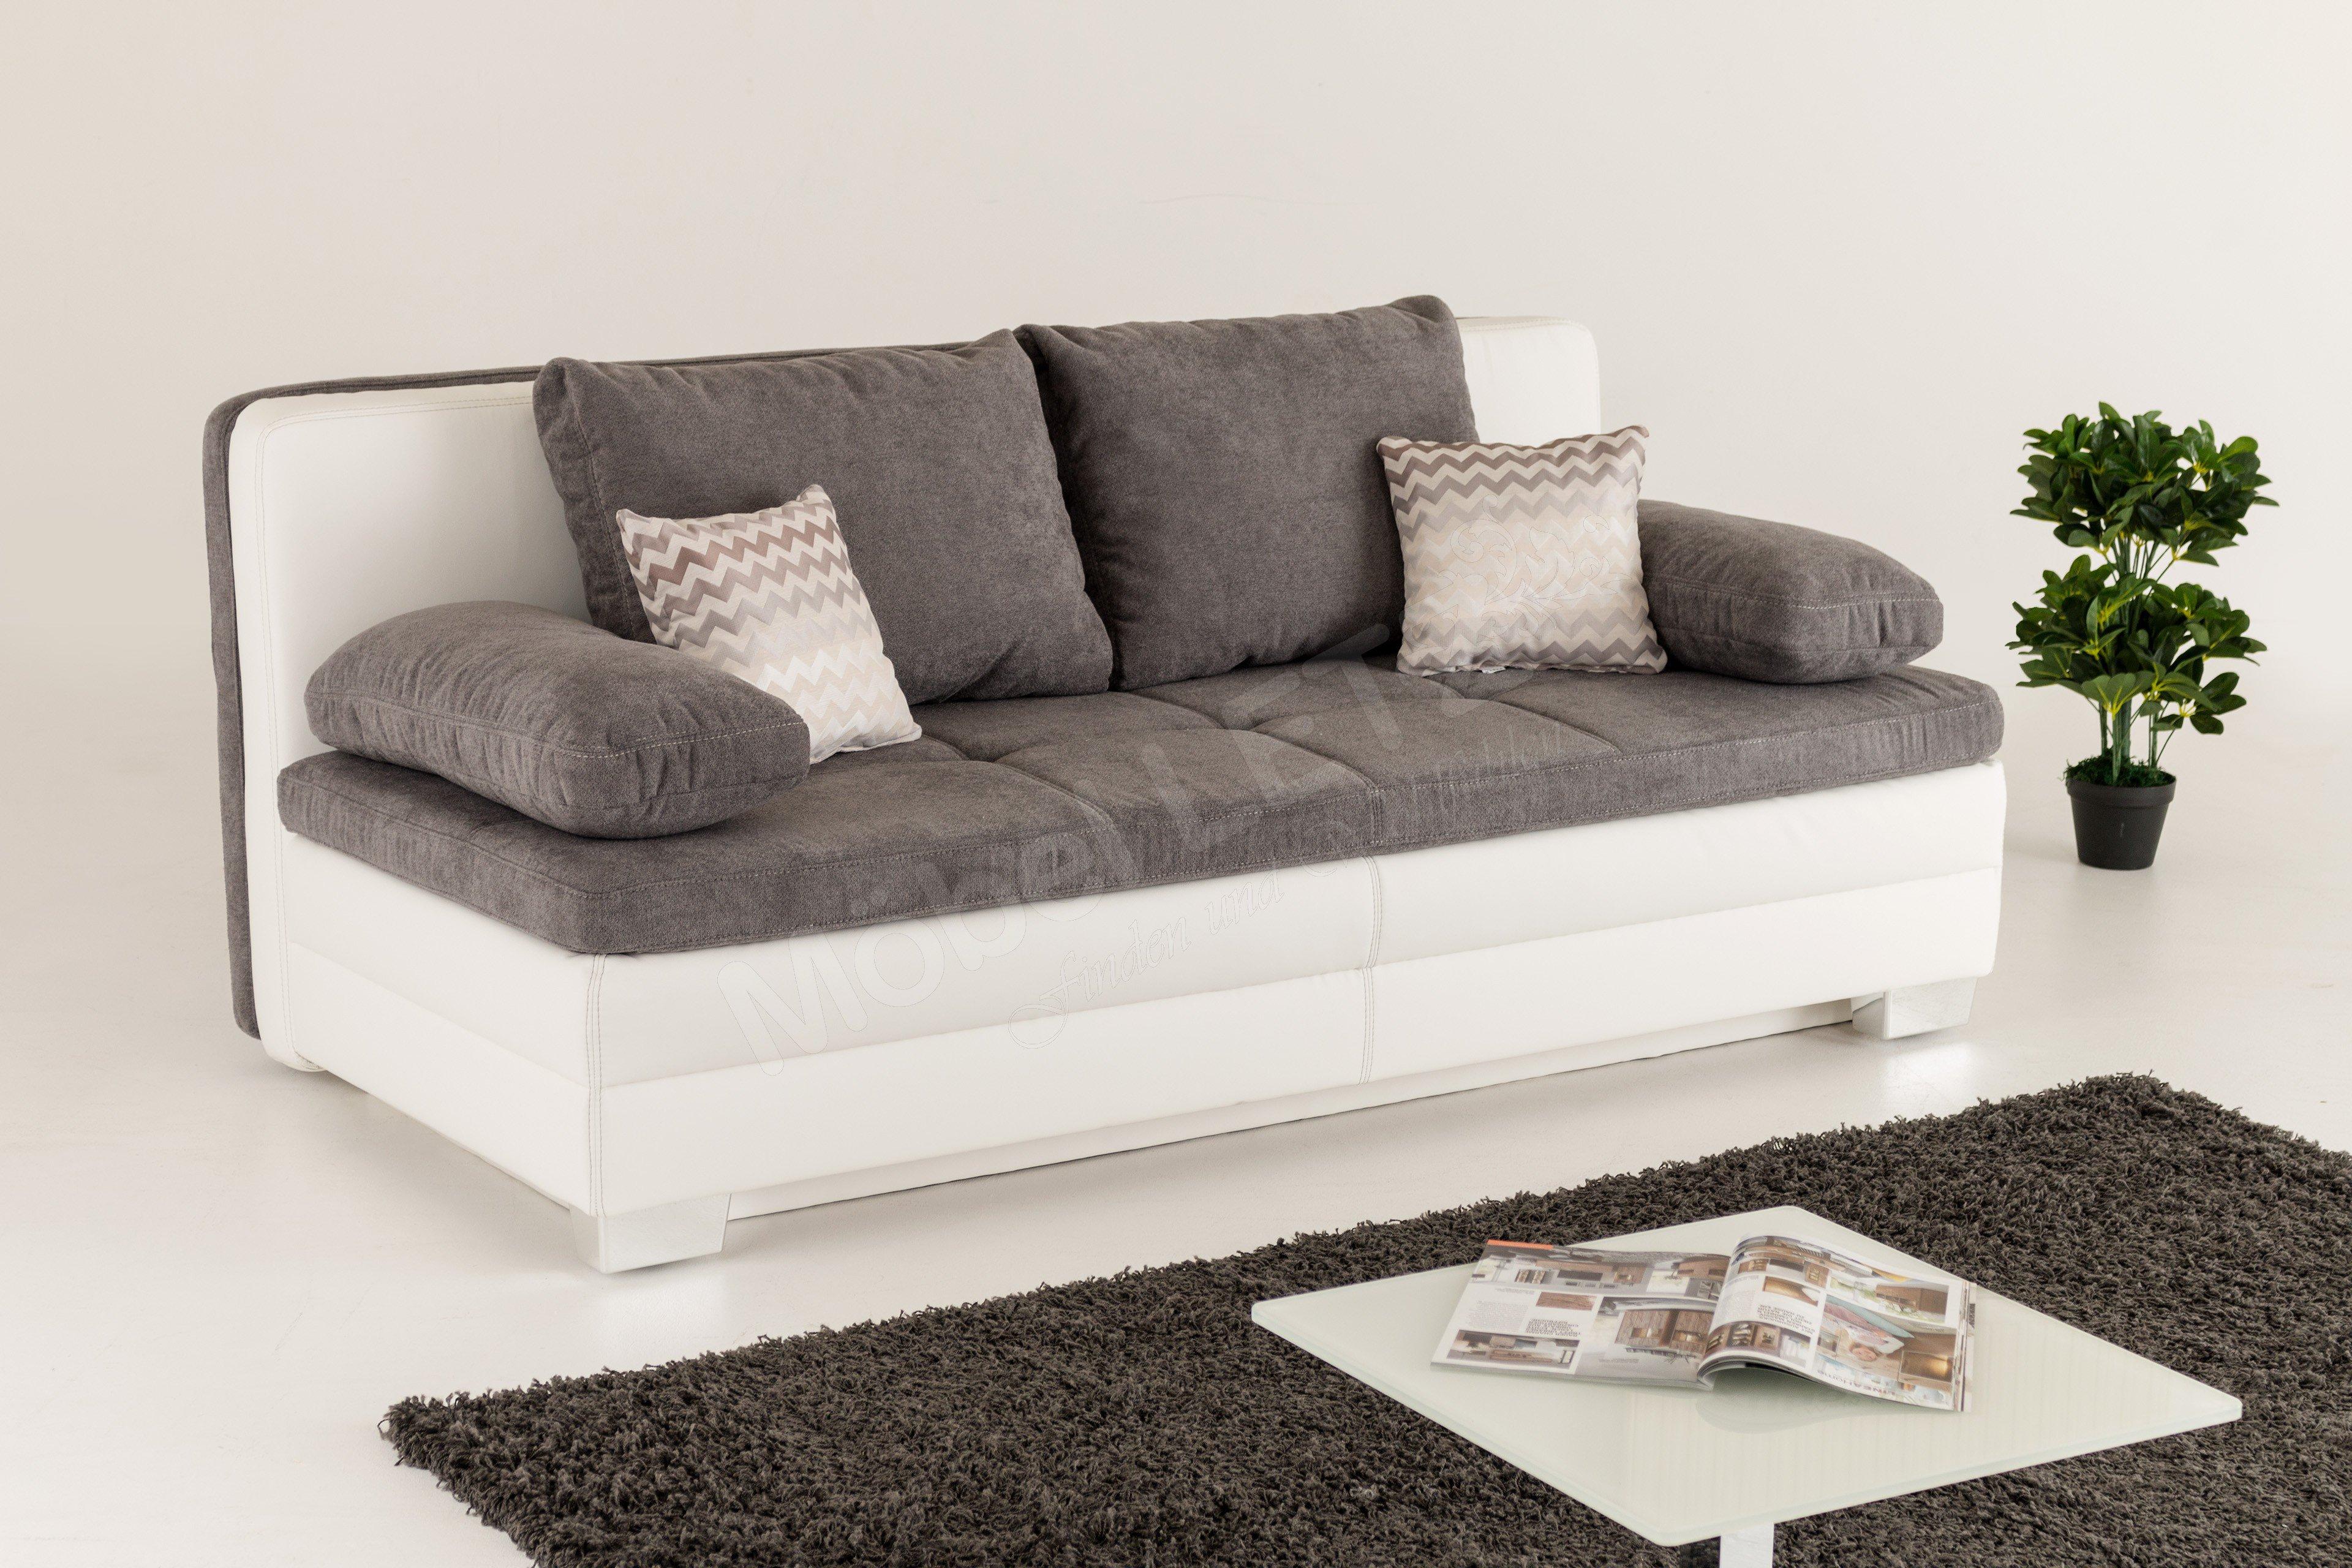 jockenh fer lincoln sabrina schlafsofa in grau wei m bel letz ihr online shop. Black Bedroom Furniture Sets. Home Design Ideas